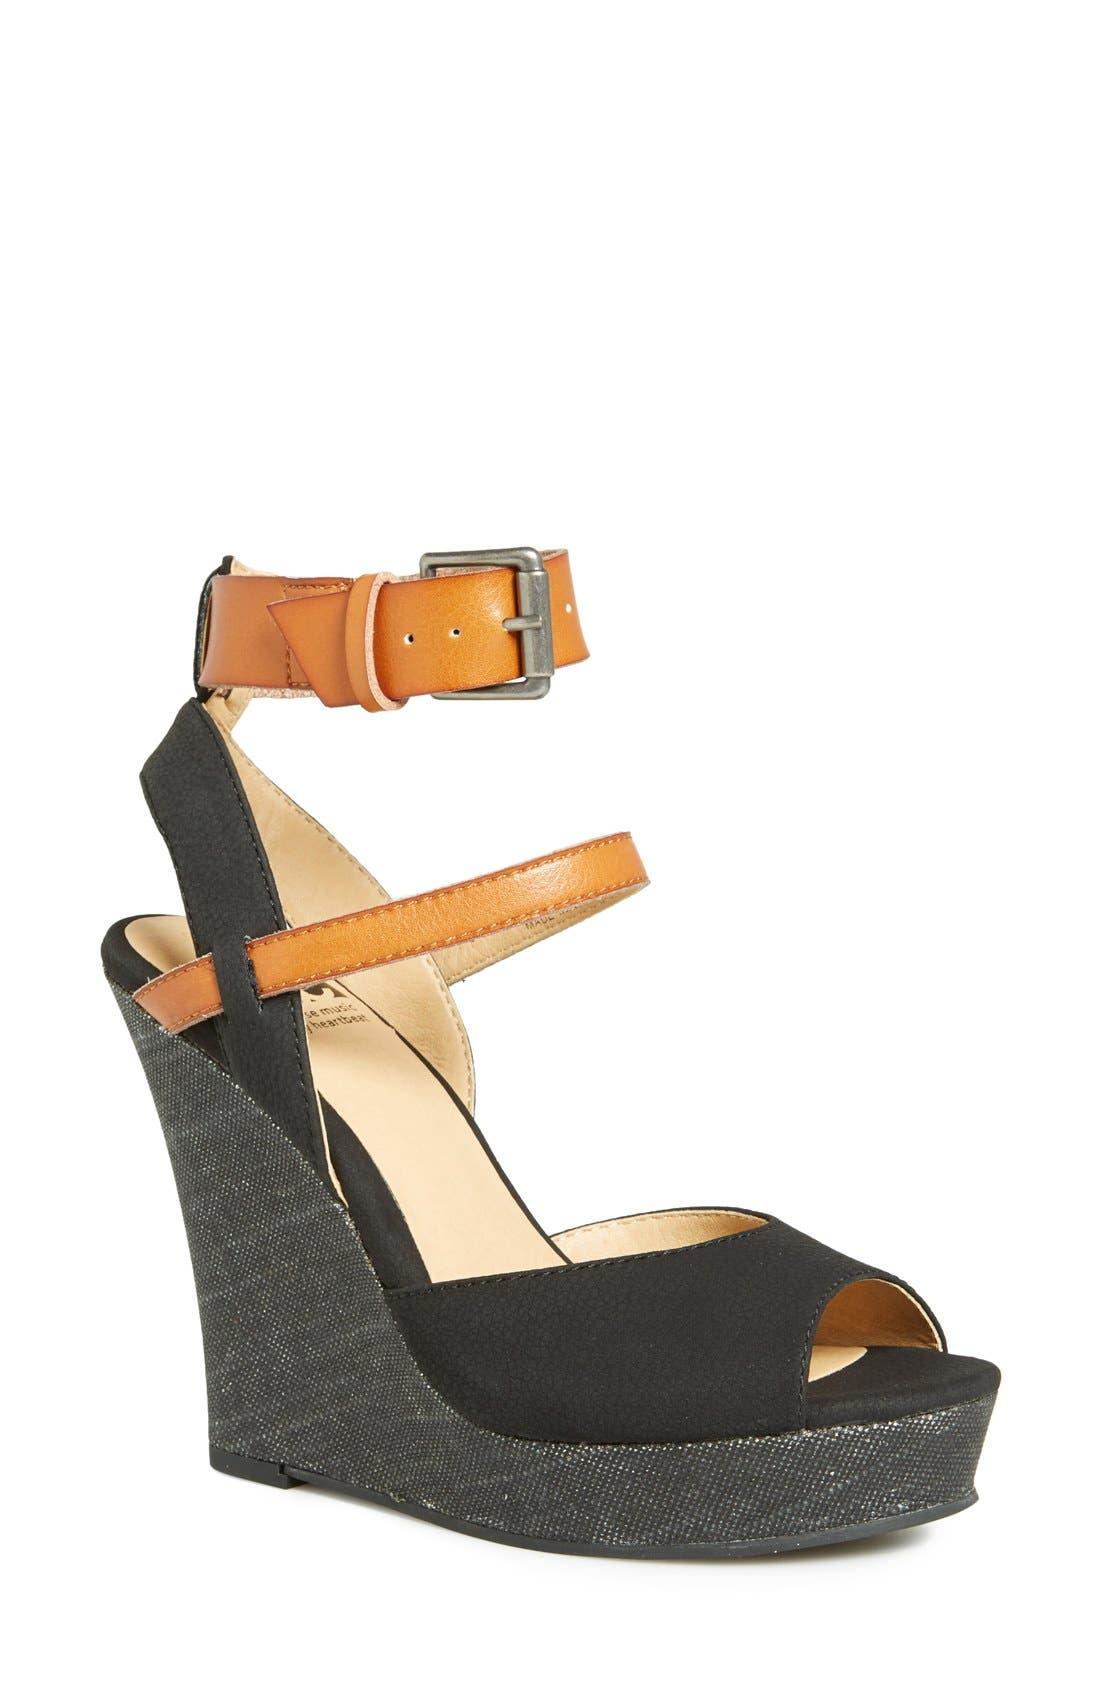 Main Image - BC Footwear 'Move It' Wedge Sandal (Women)